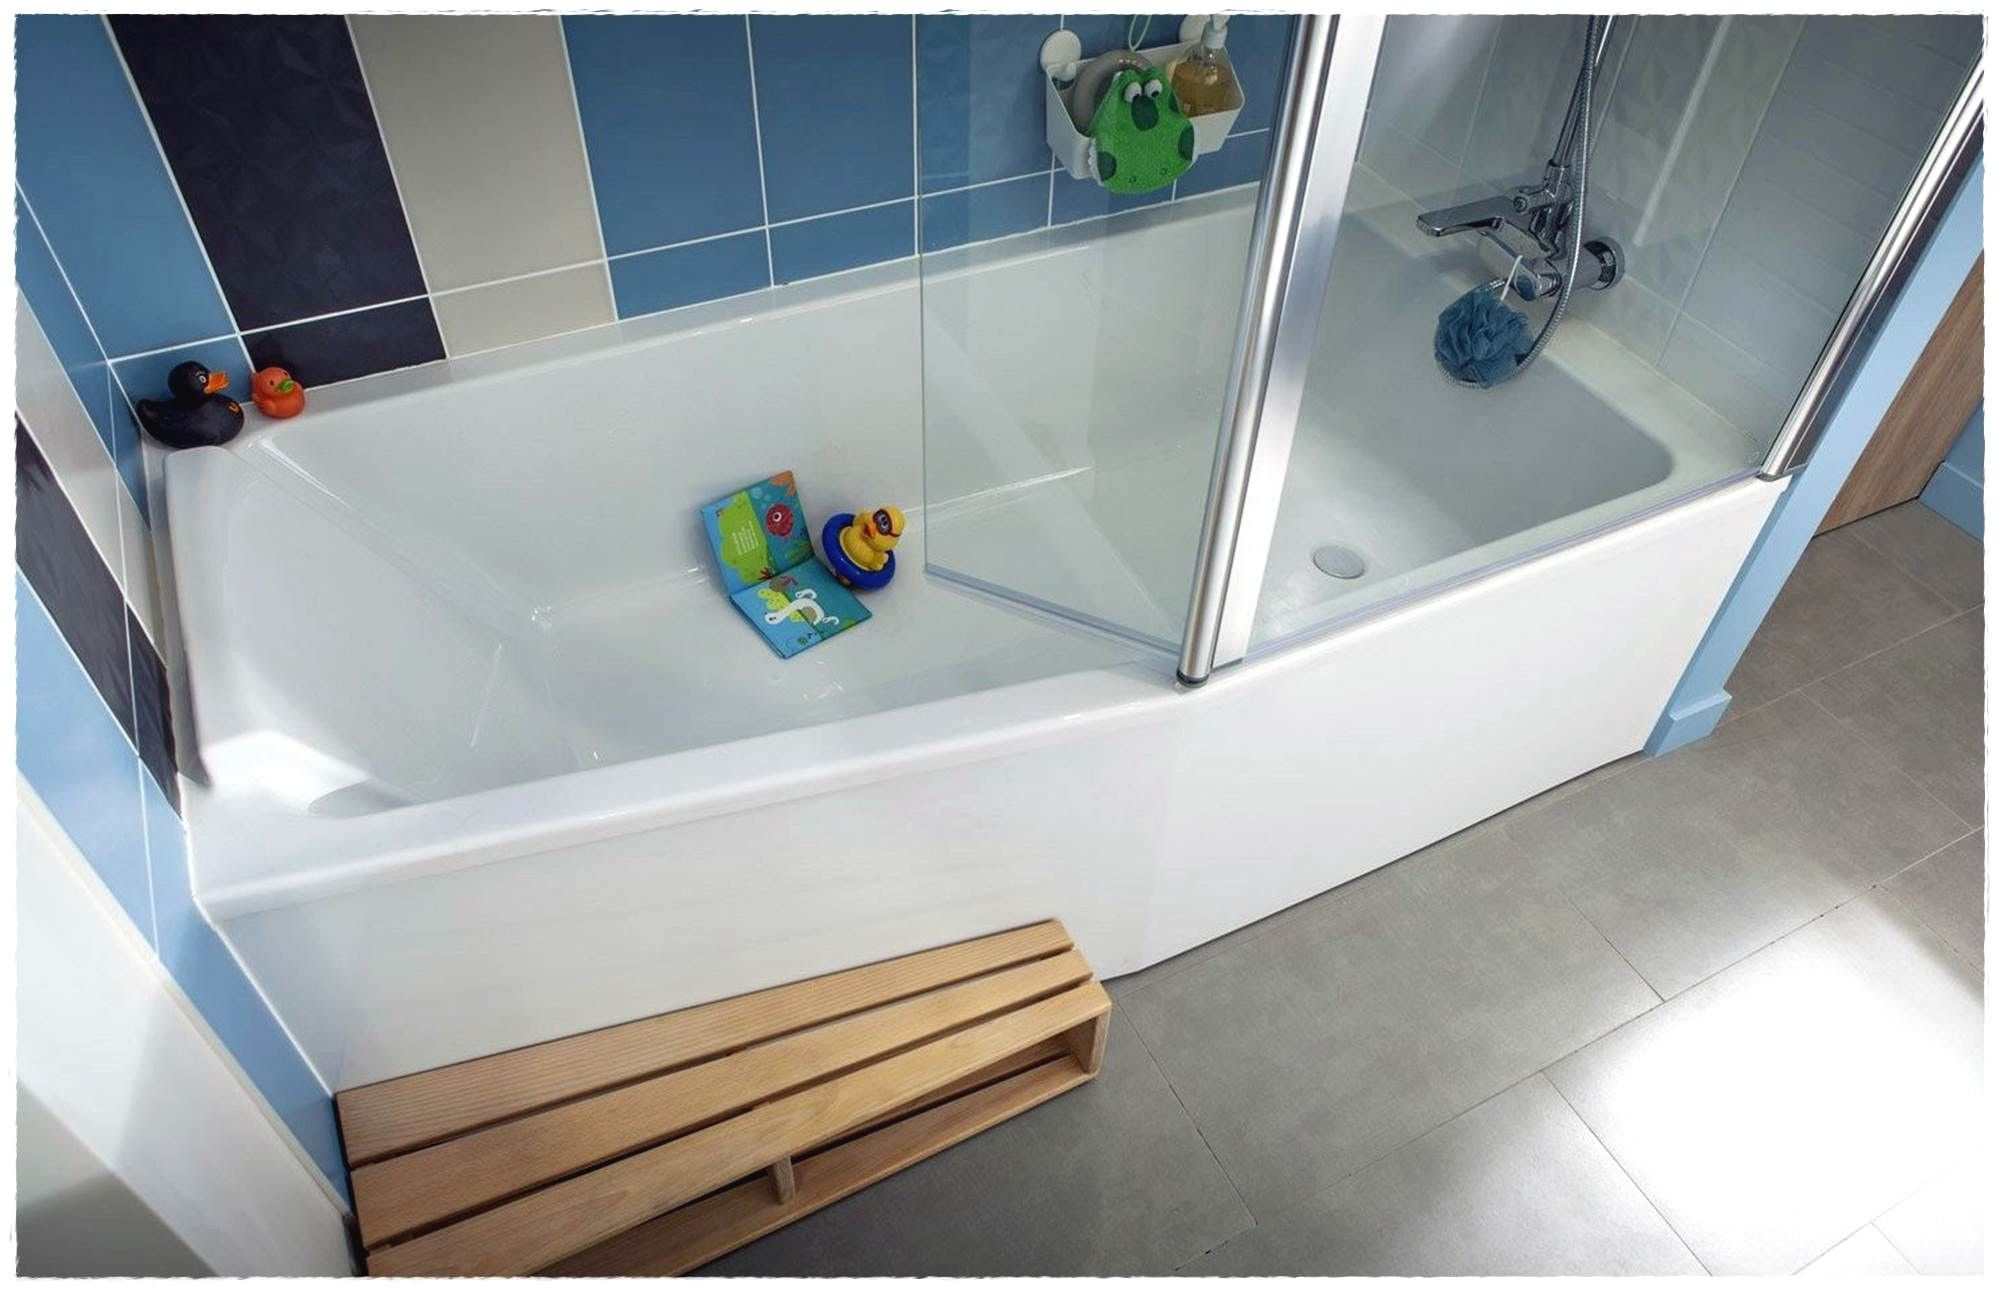 Tablier De Baignoire Brico Depot Pour Votre Prochain Reno Creative Bathroom Design Bathtub Bathroom Design Layout